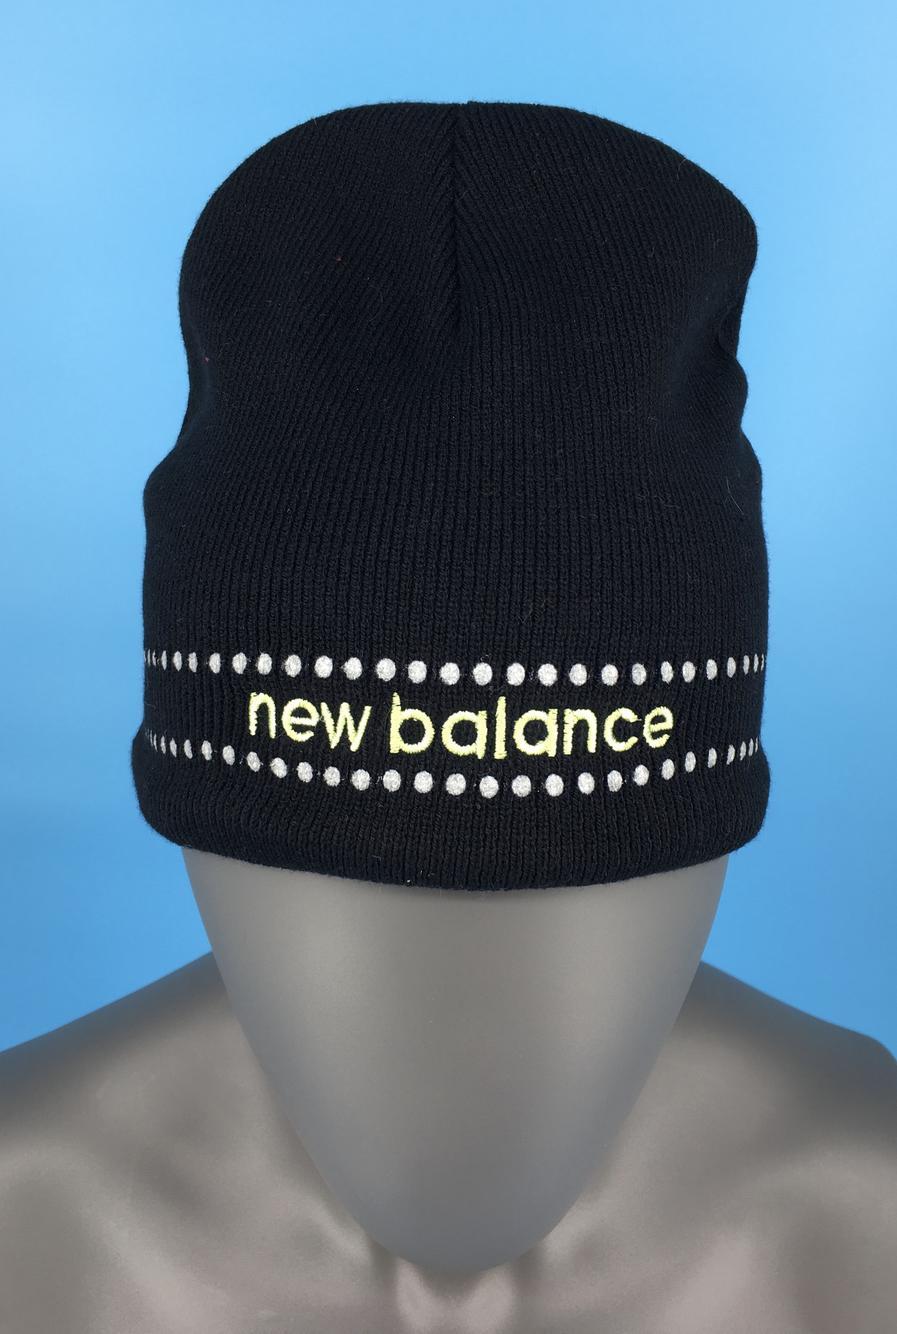 new balance beanie hat